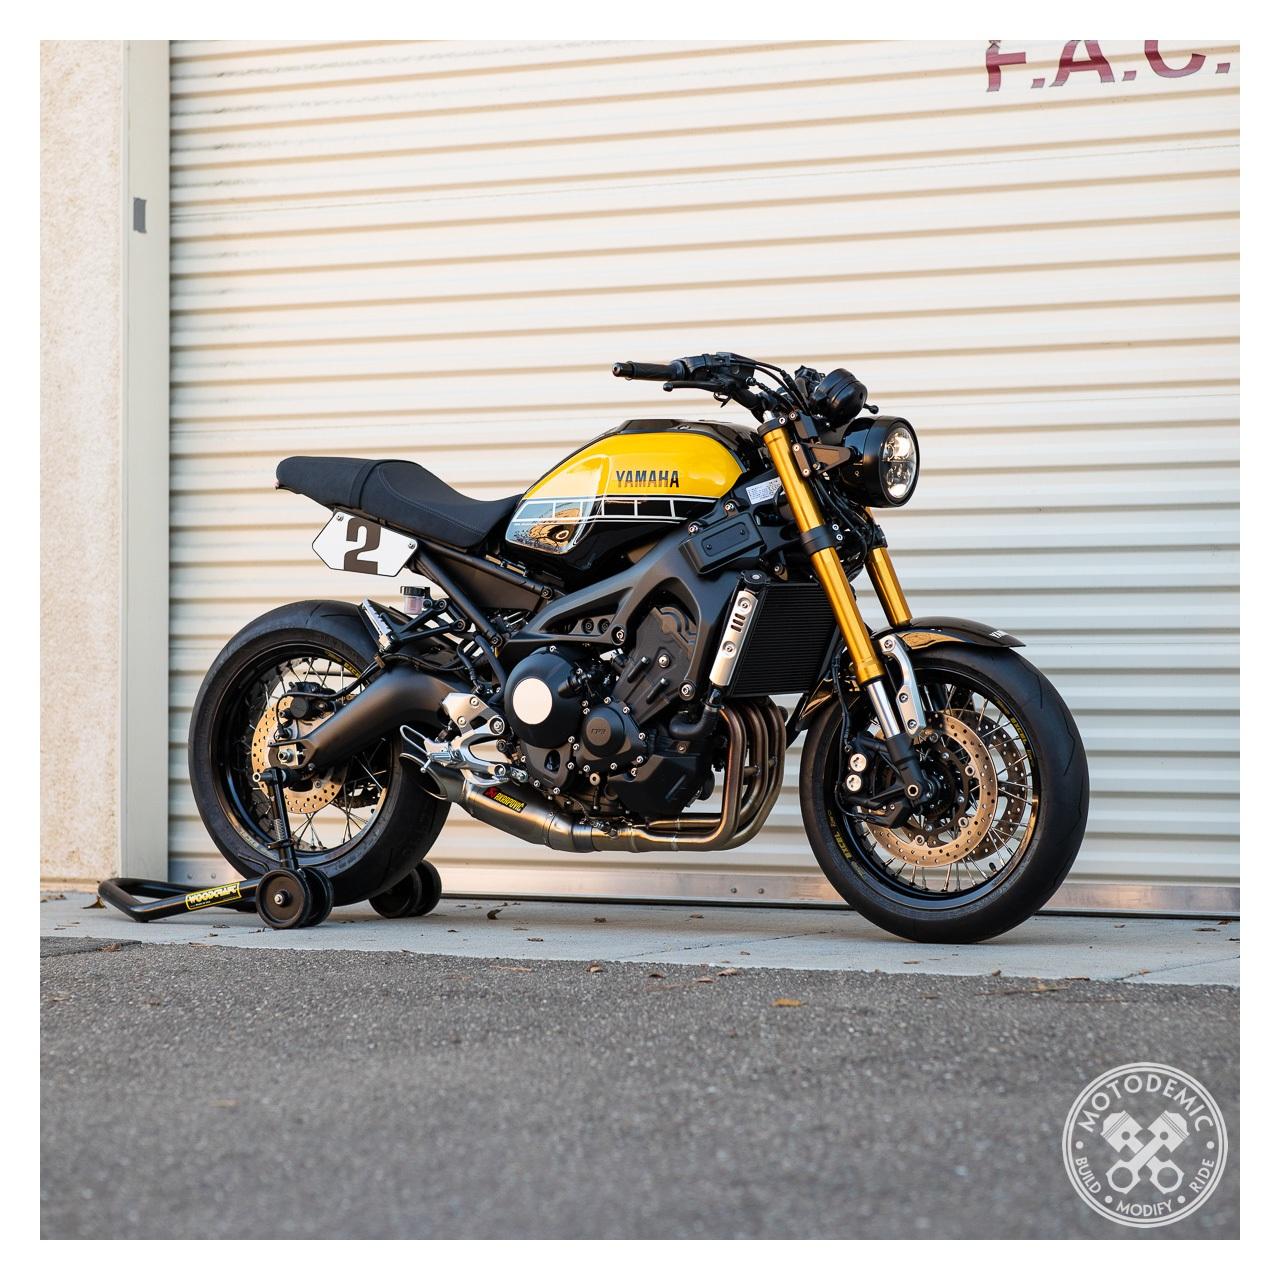 Yamaha Urban Winter Black Leather Motorcycle Gloves RRP £48.99